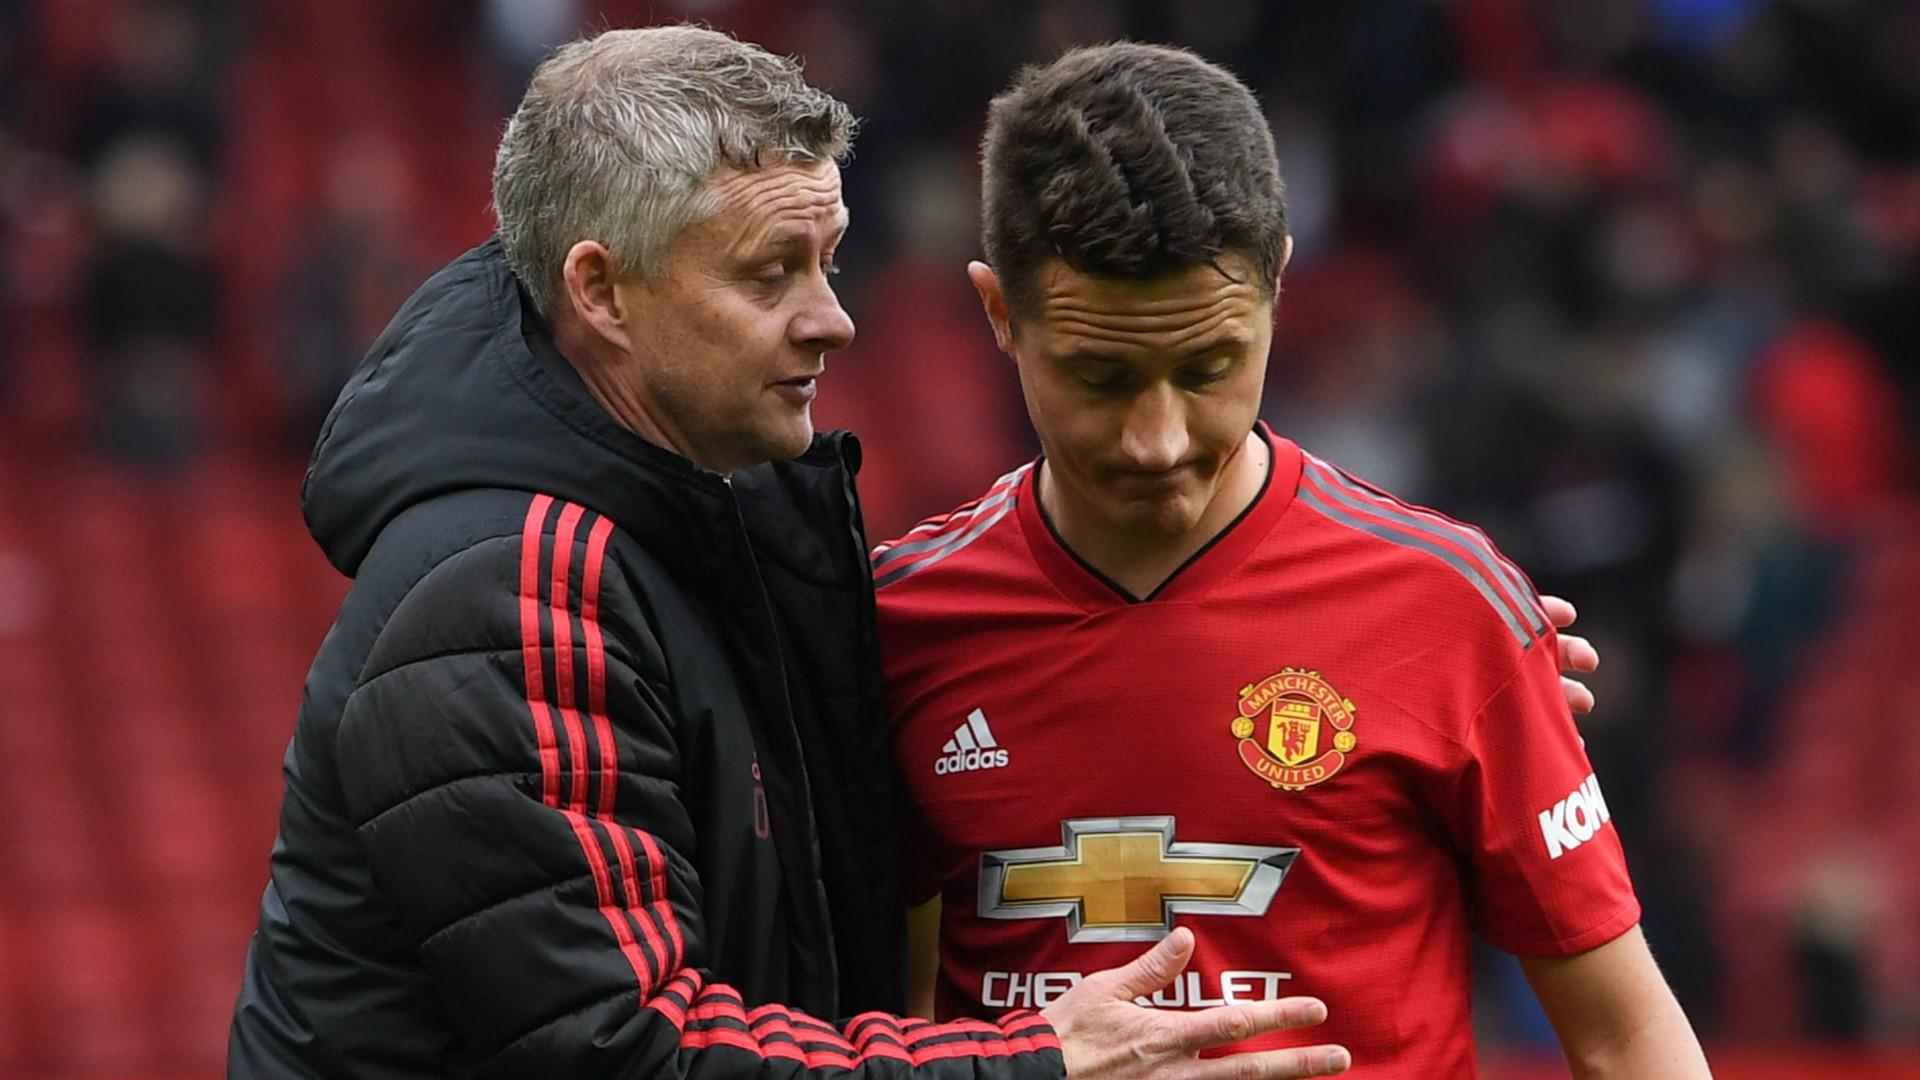 Rencana Transfer & Jadwal Pramusim Manchester United Musim